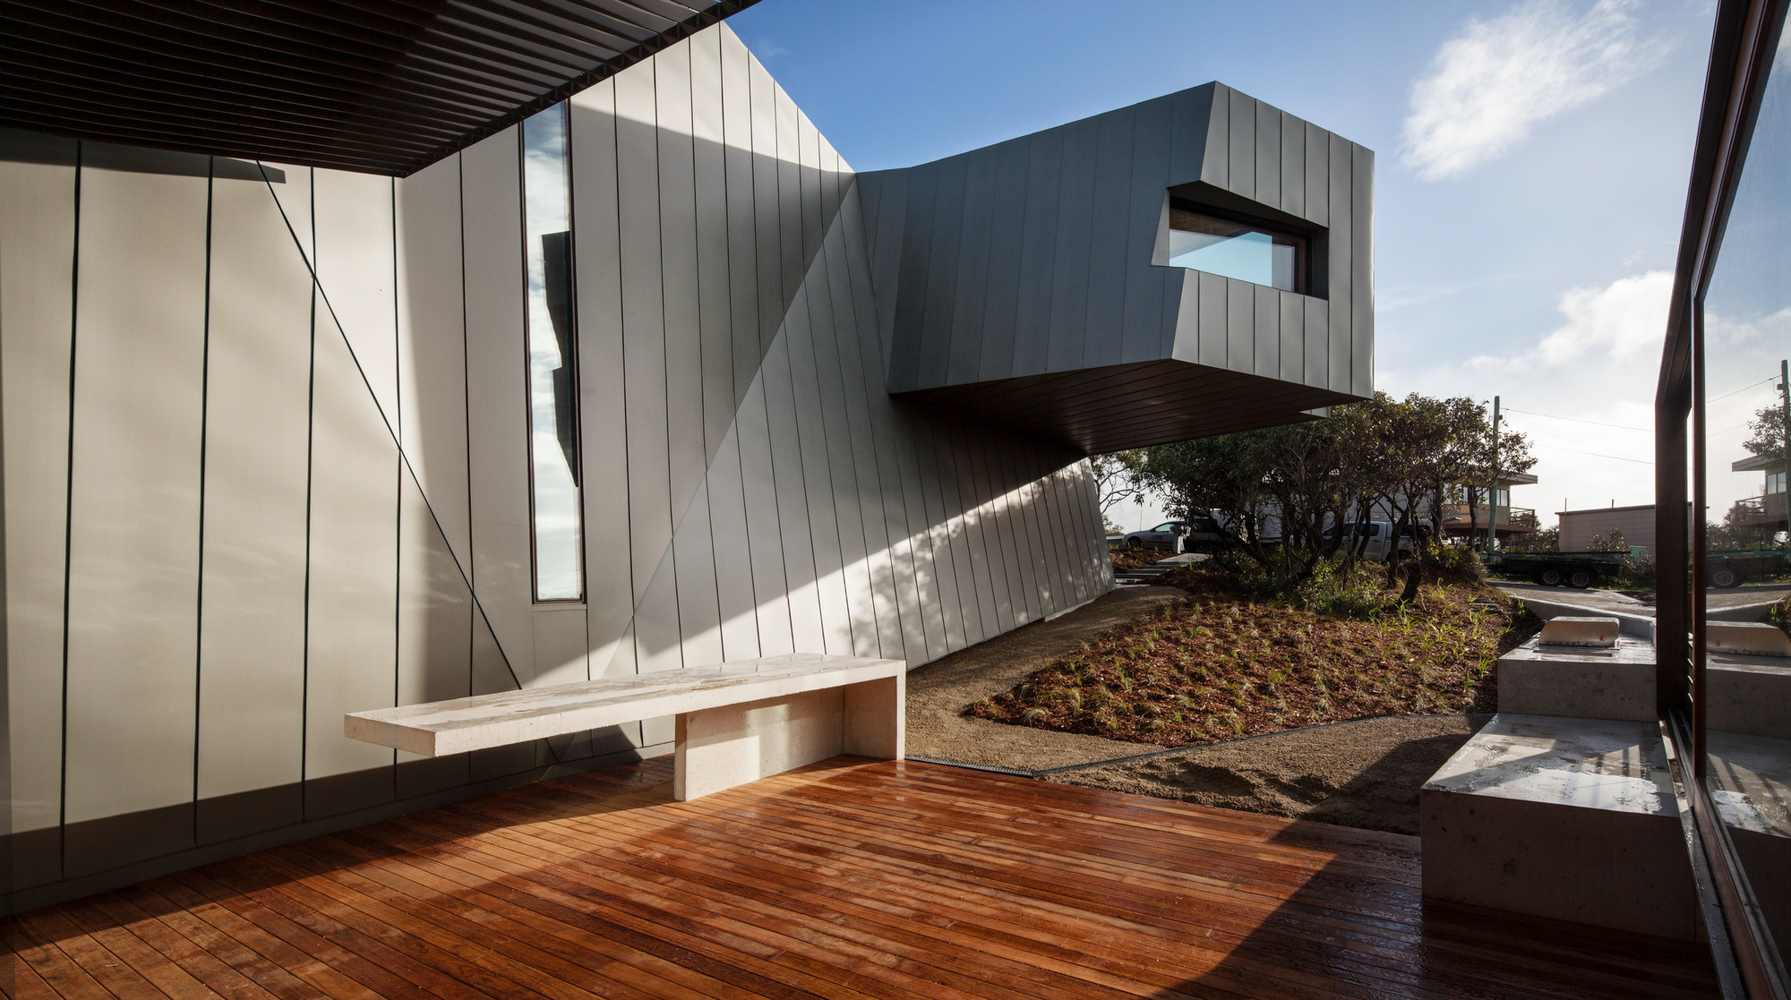 fairhaven-beach-house-john-wardle-architects-the-design-emotive-01.jpg